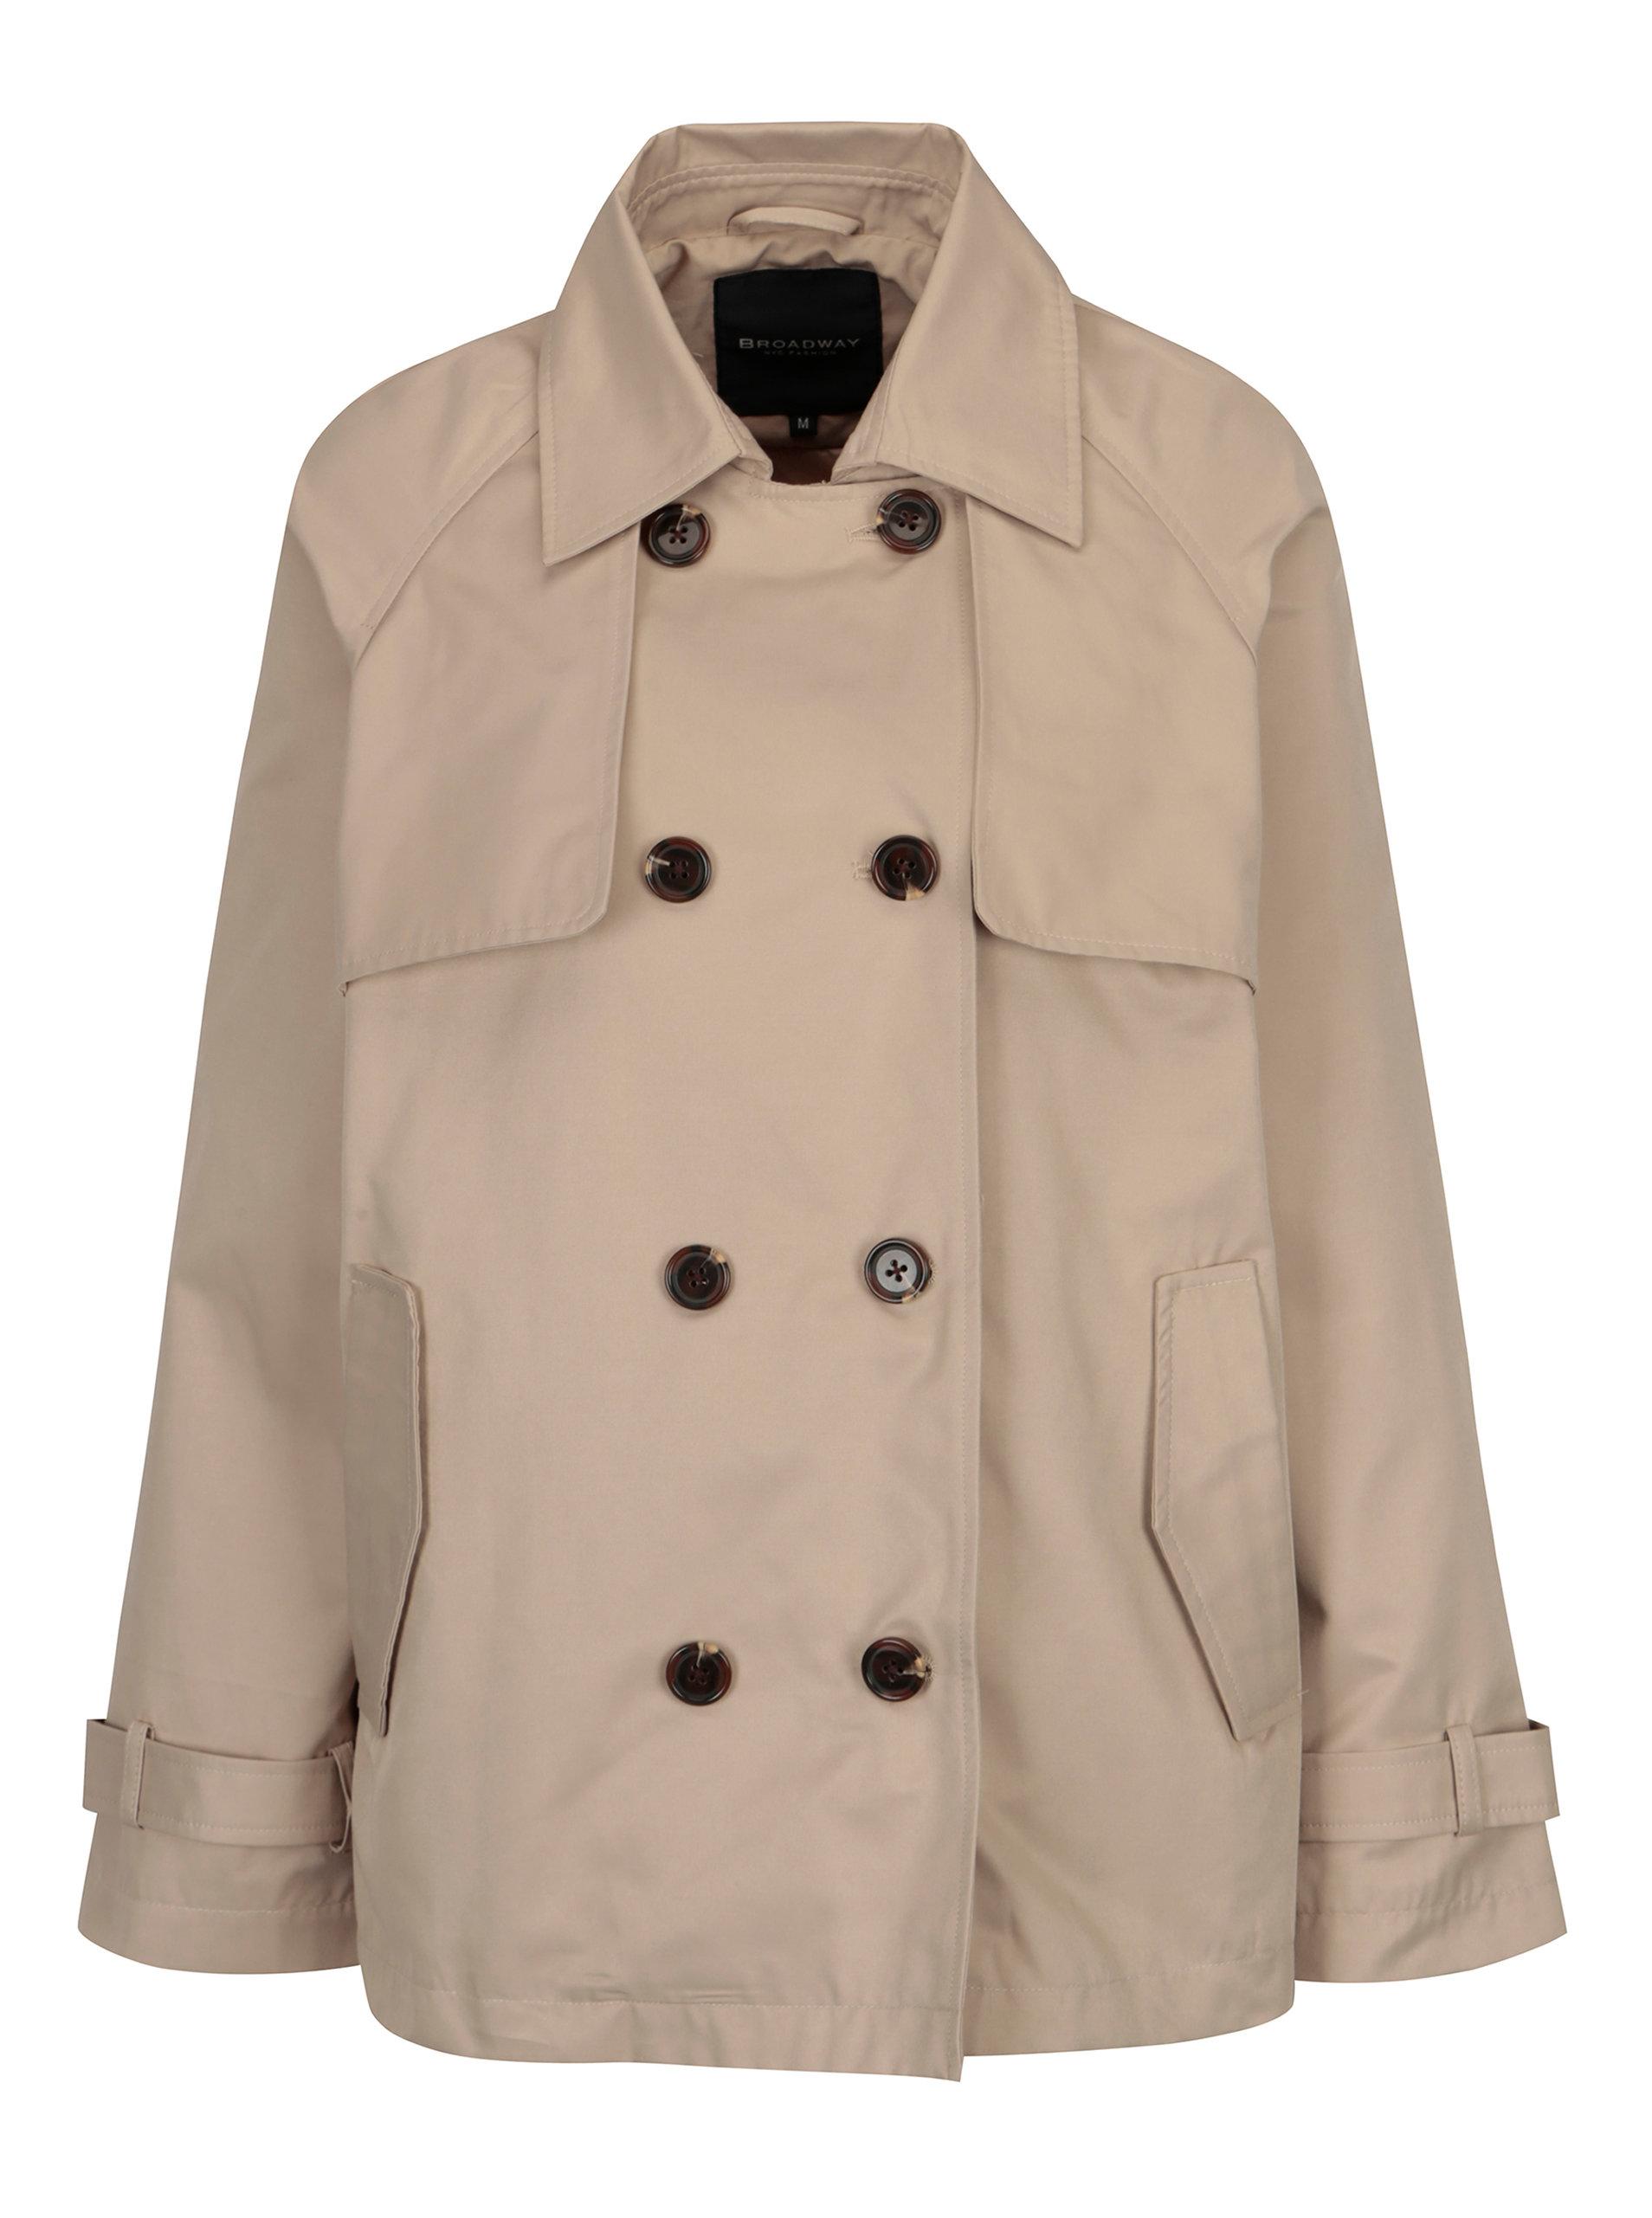 b57a52aaa0 Béžový dámsky krátky kabát Broadway Breena ...